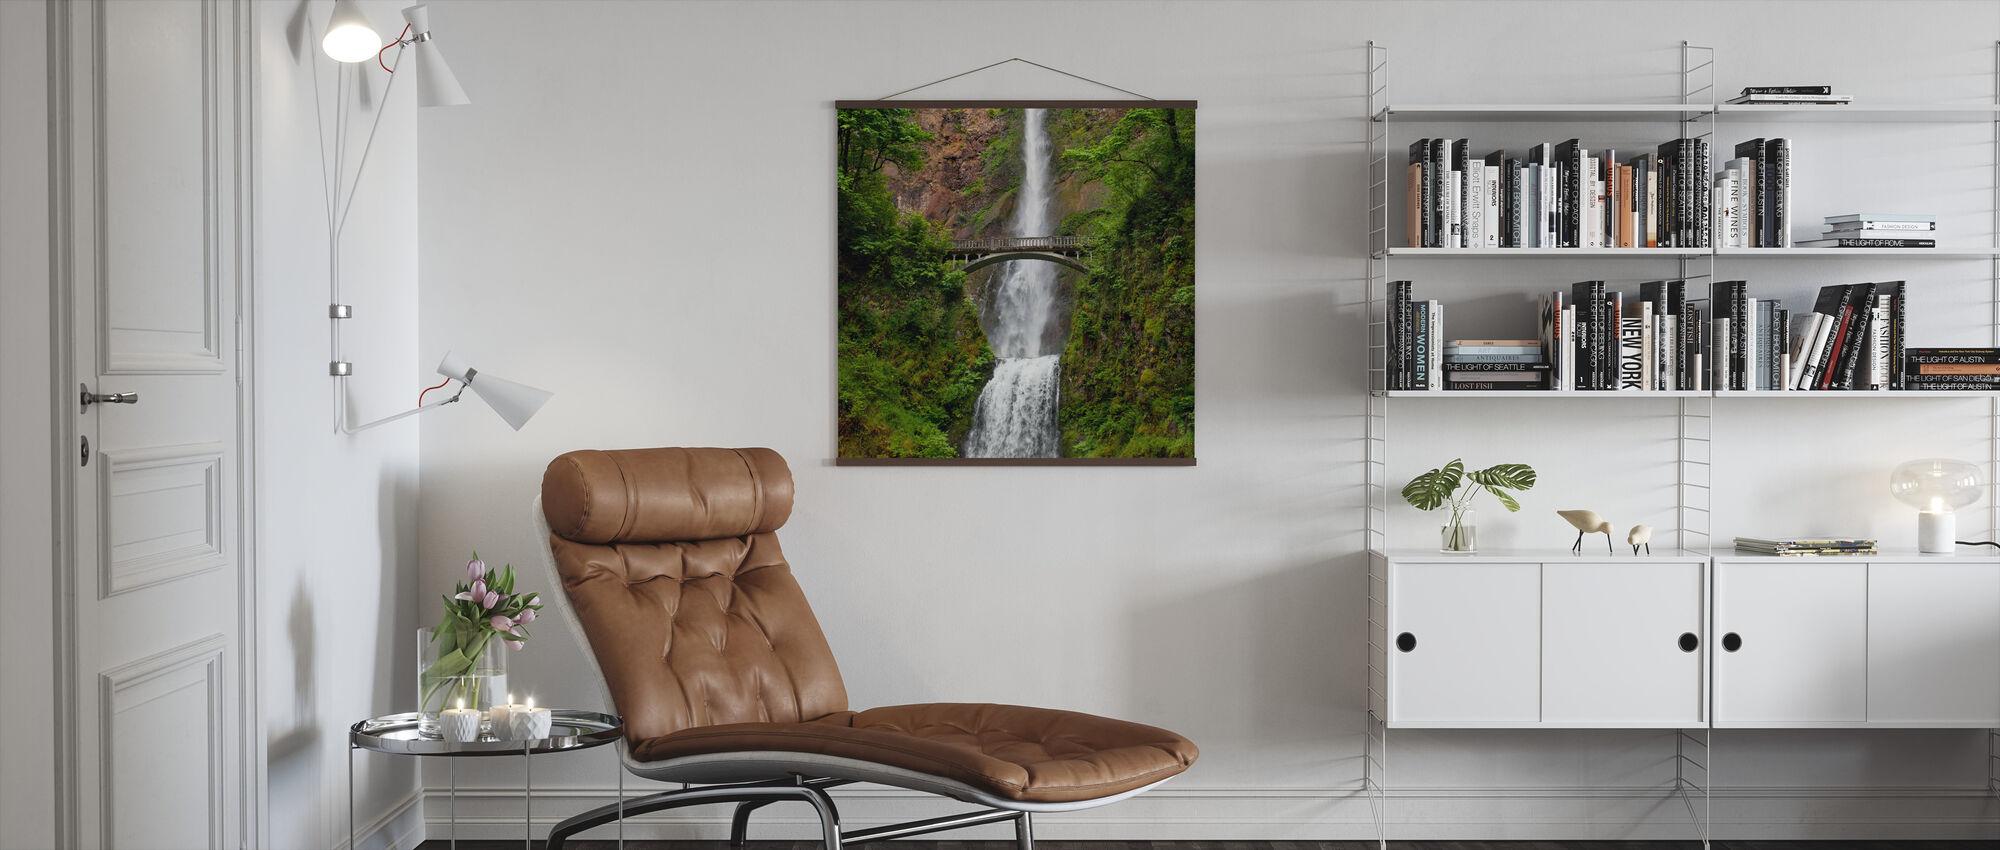 Multnomah Falls - Poster - Living Room